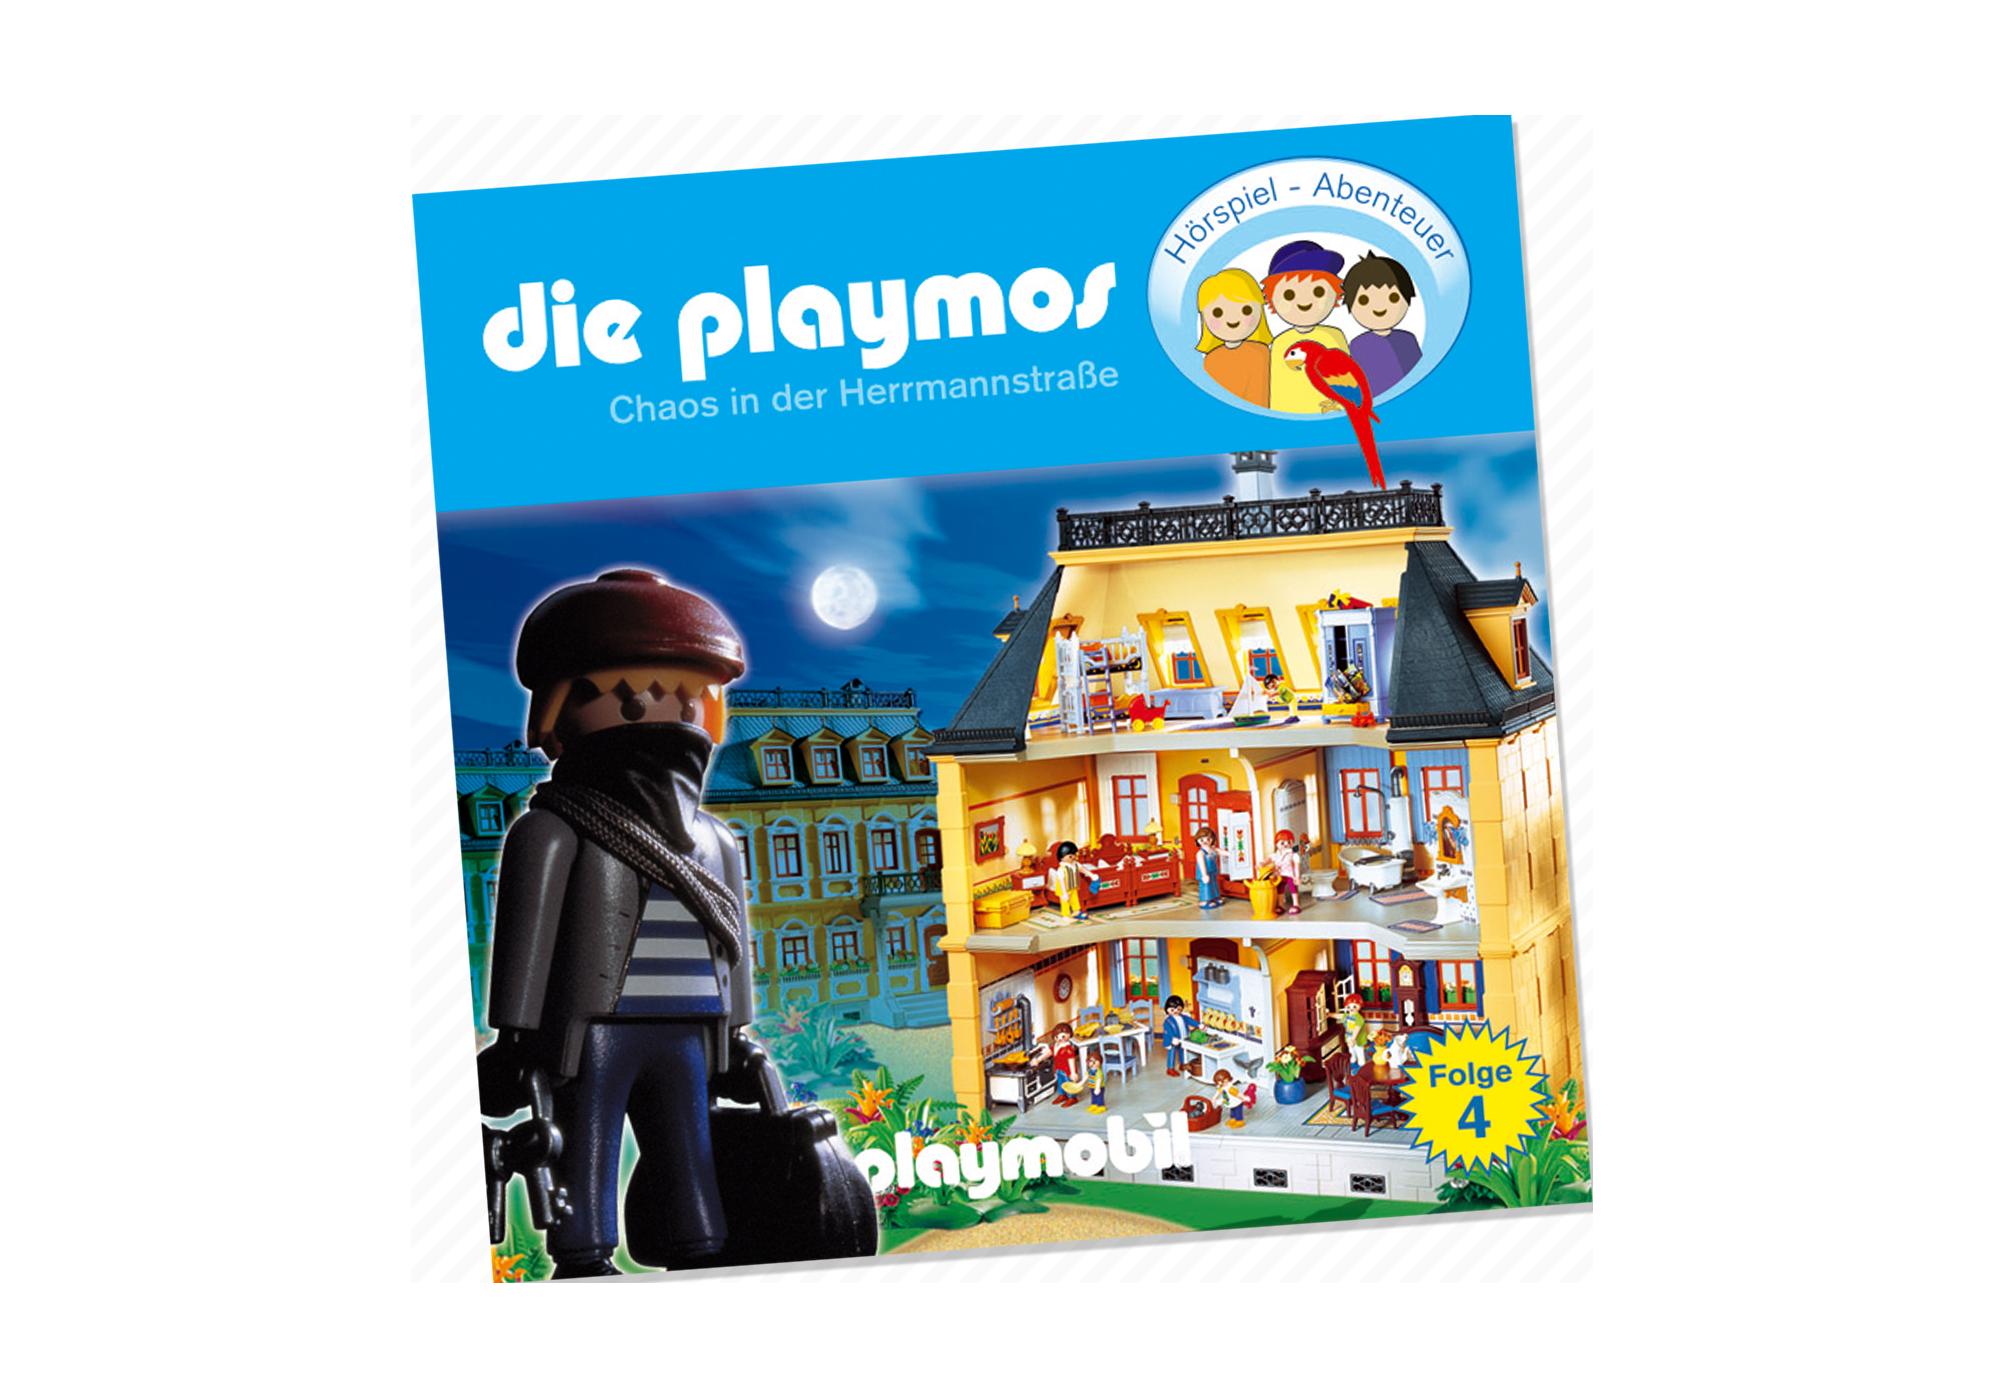 http://media.playmobil.com/i/playmobil/80134_product_detail